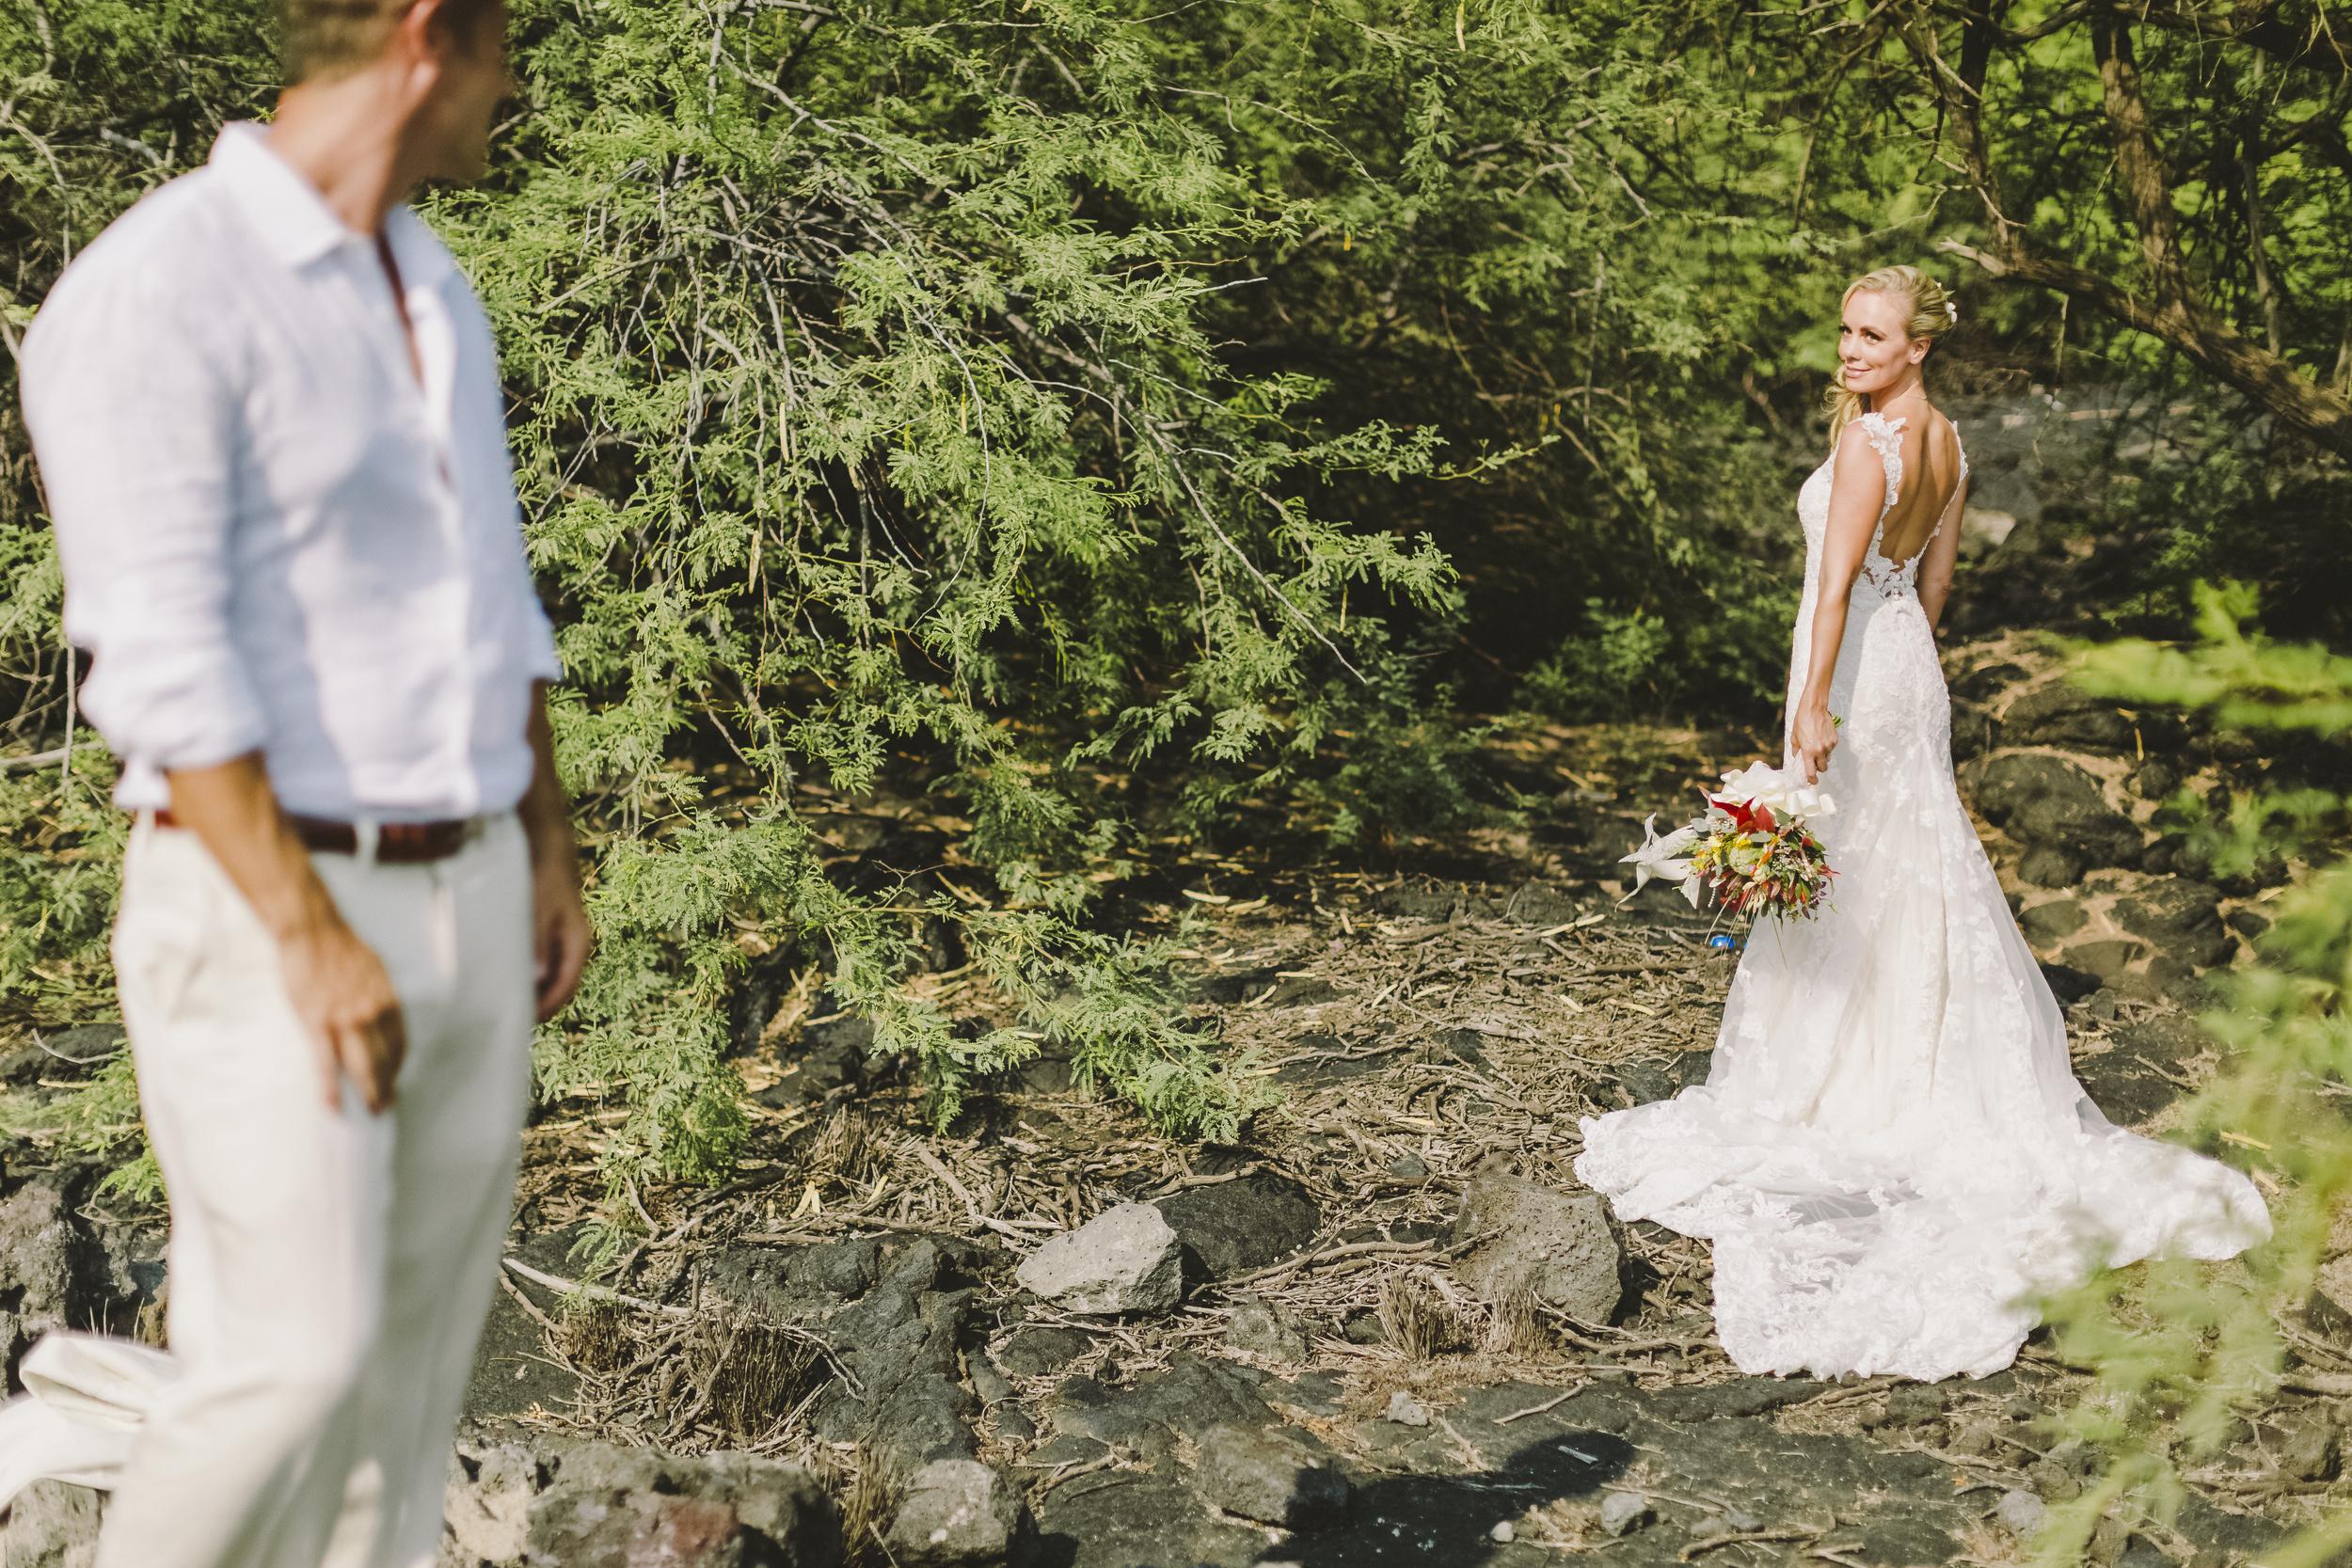 angie-diaz-photography-hawaii-wedding-photographer-kelli-jay-33.jpg